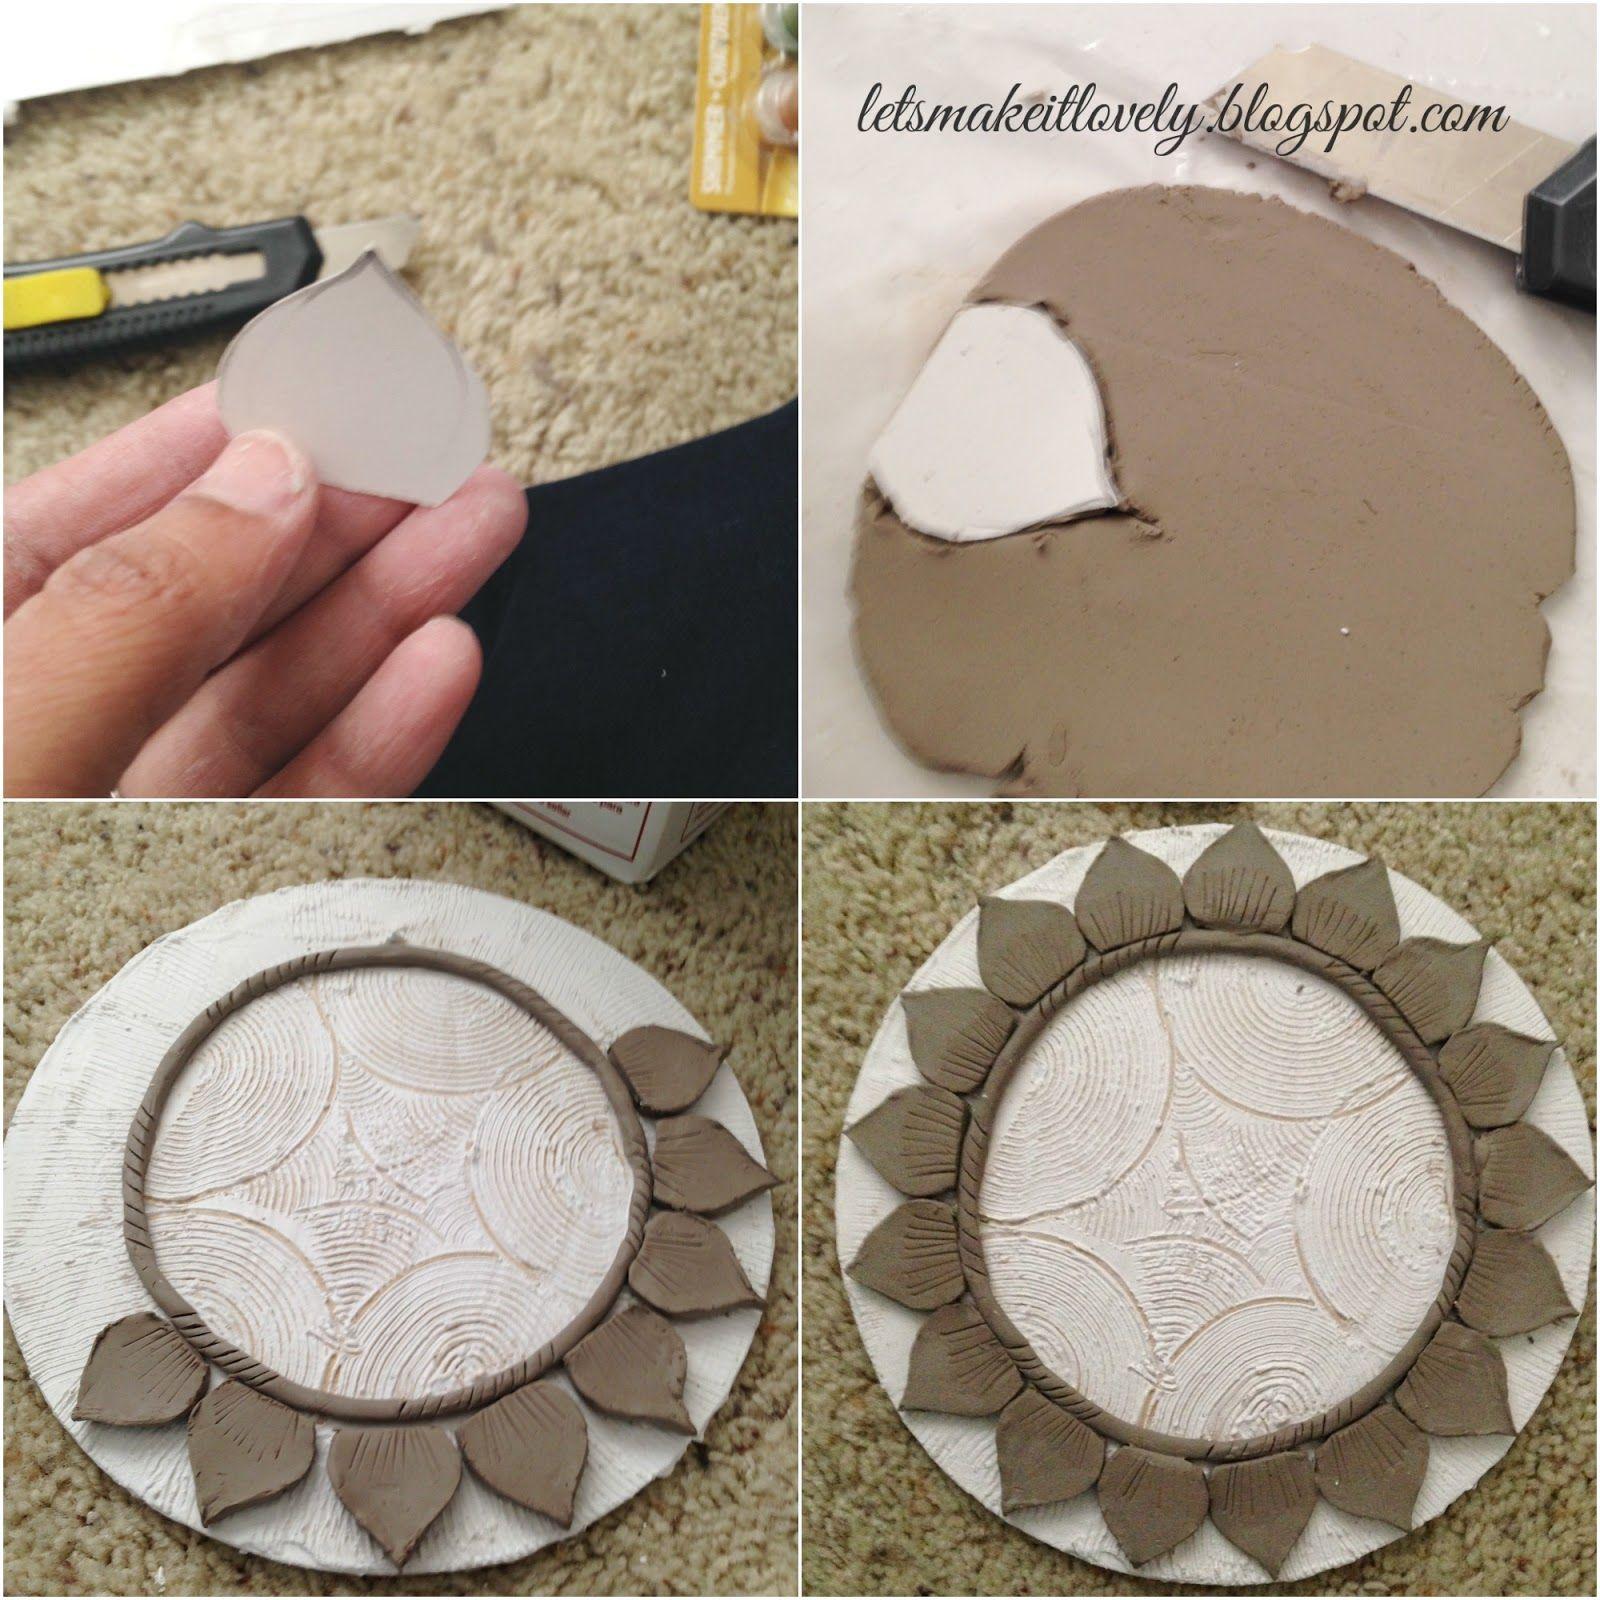 Pin By Smita On Murals Ceramic Art Mural Art Clay Crafts